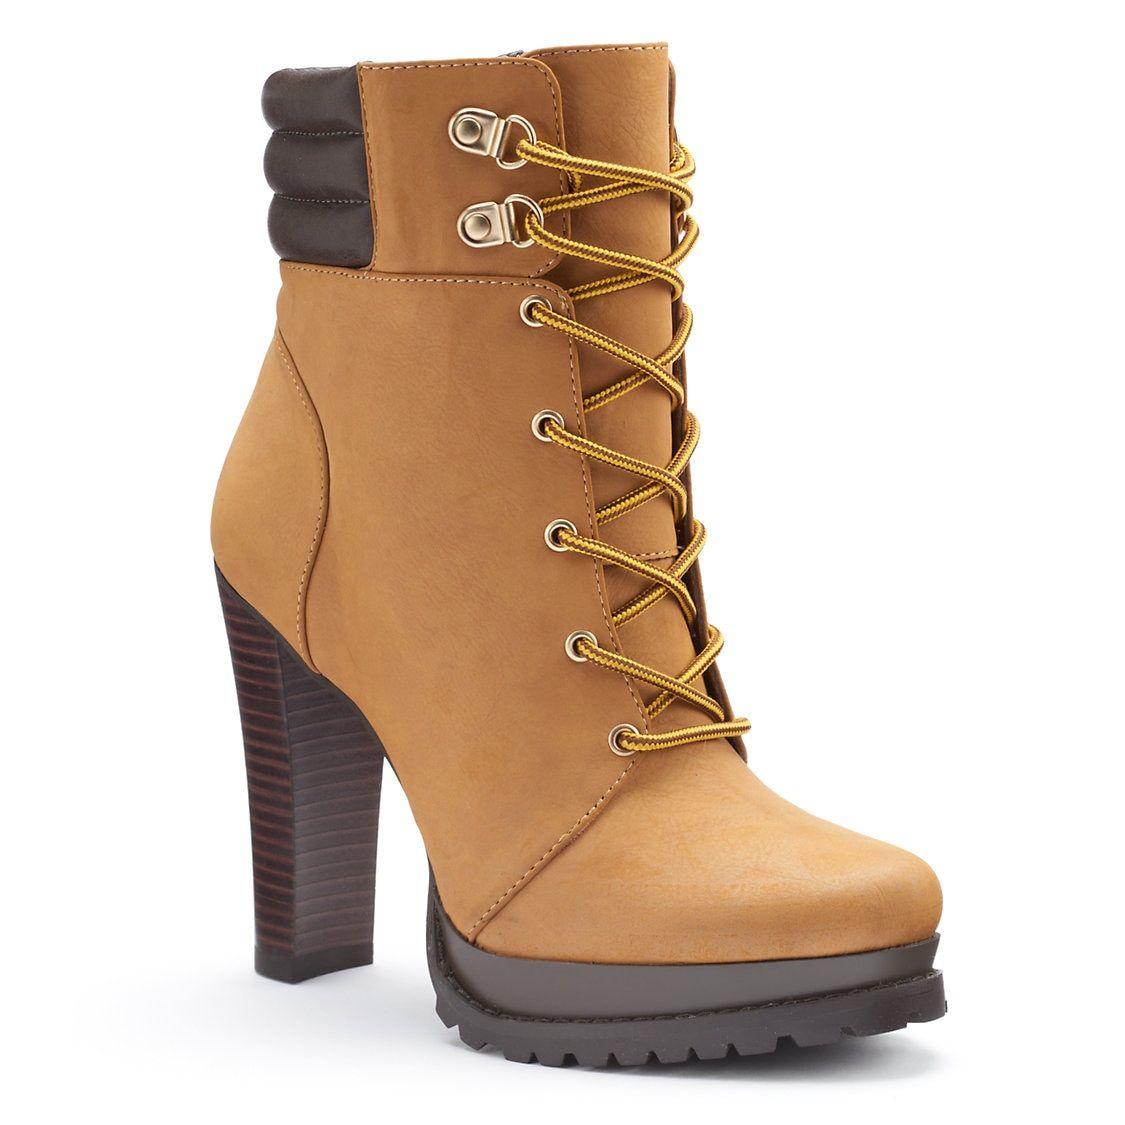 Jennifer Lopez Women's Platform High Heel Ankle Boots | Kohls